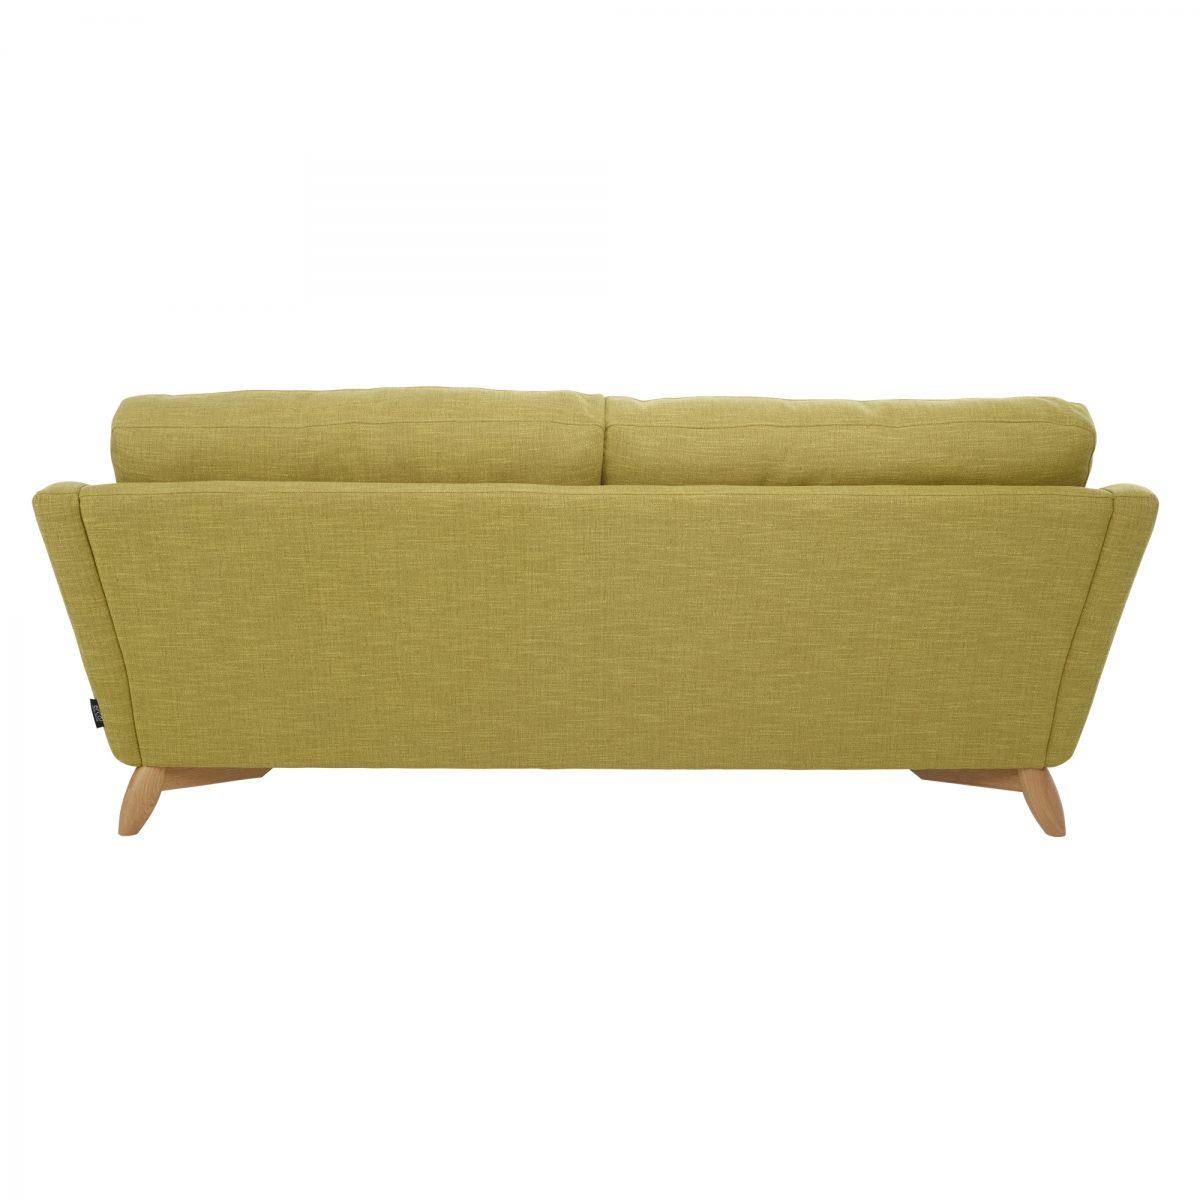 Cosenza 3330 L Largesofa Cutoutback Oak Cm T302